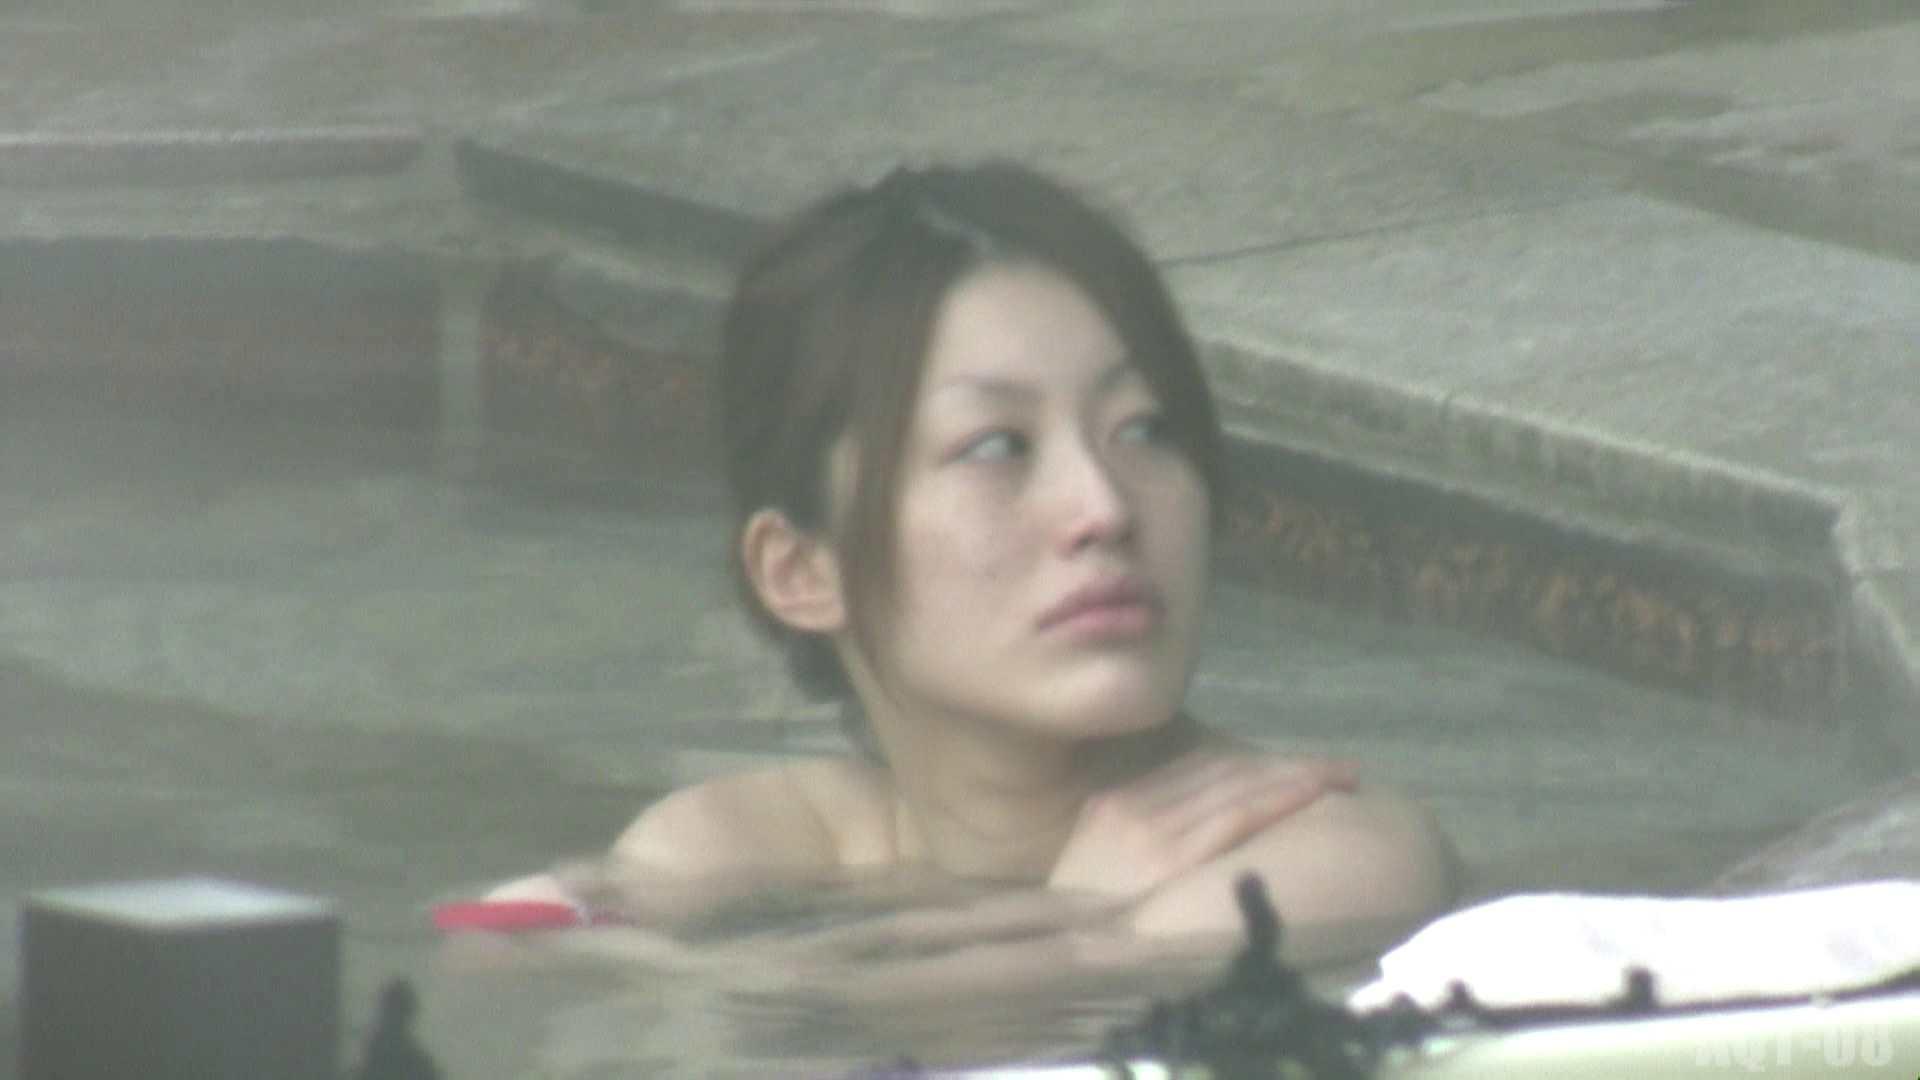 Aquaな露天風呂Vol.775 盗撮映像  74Pix 20